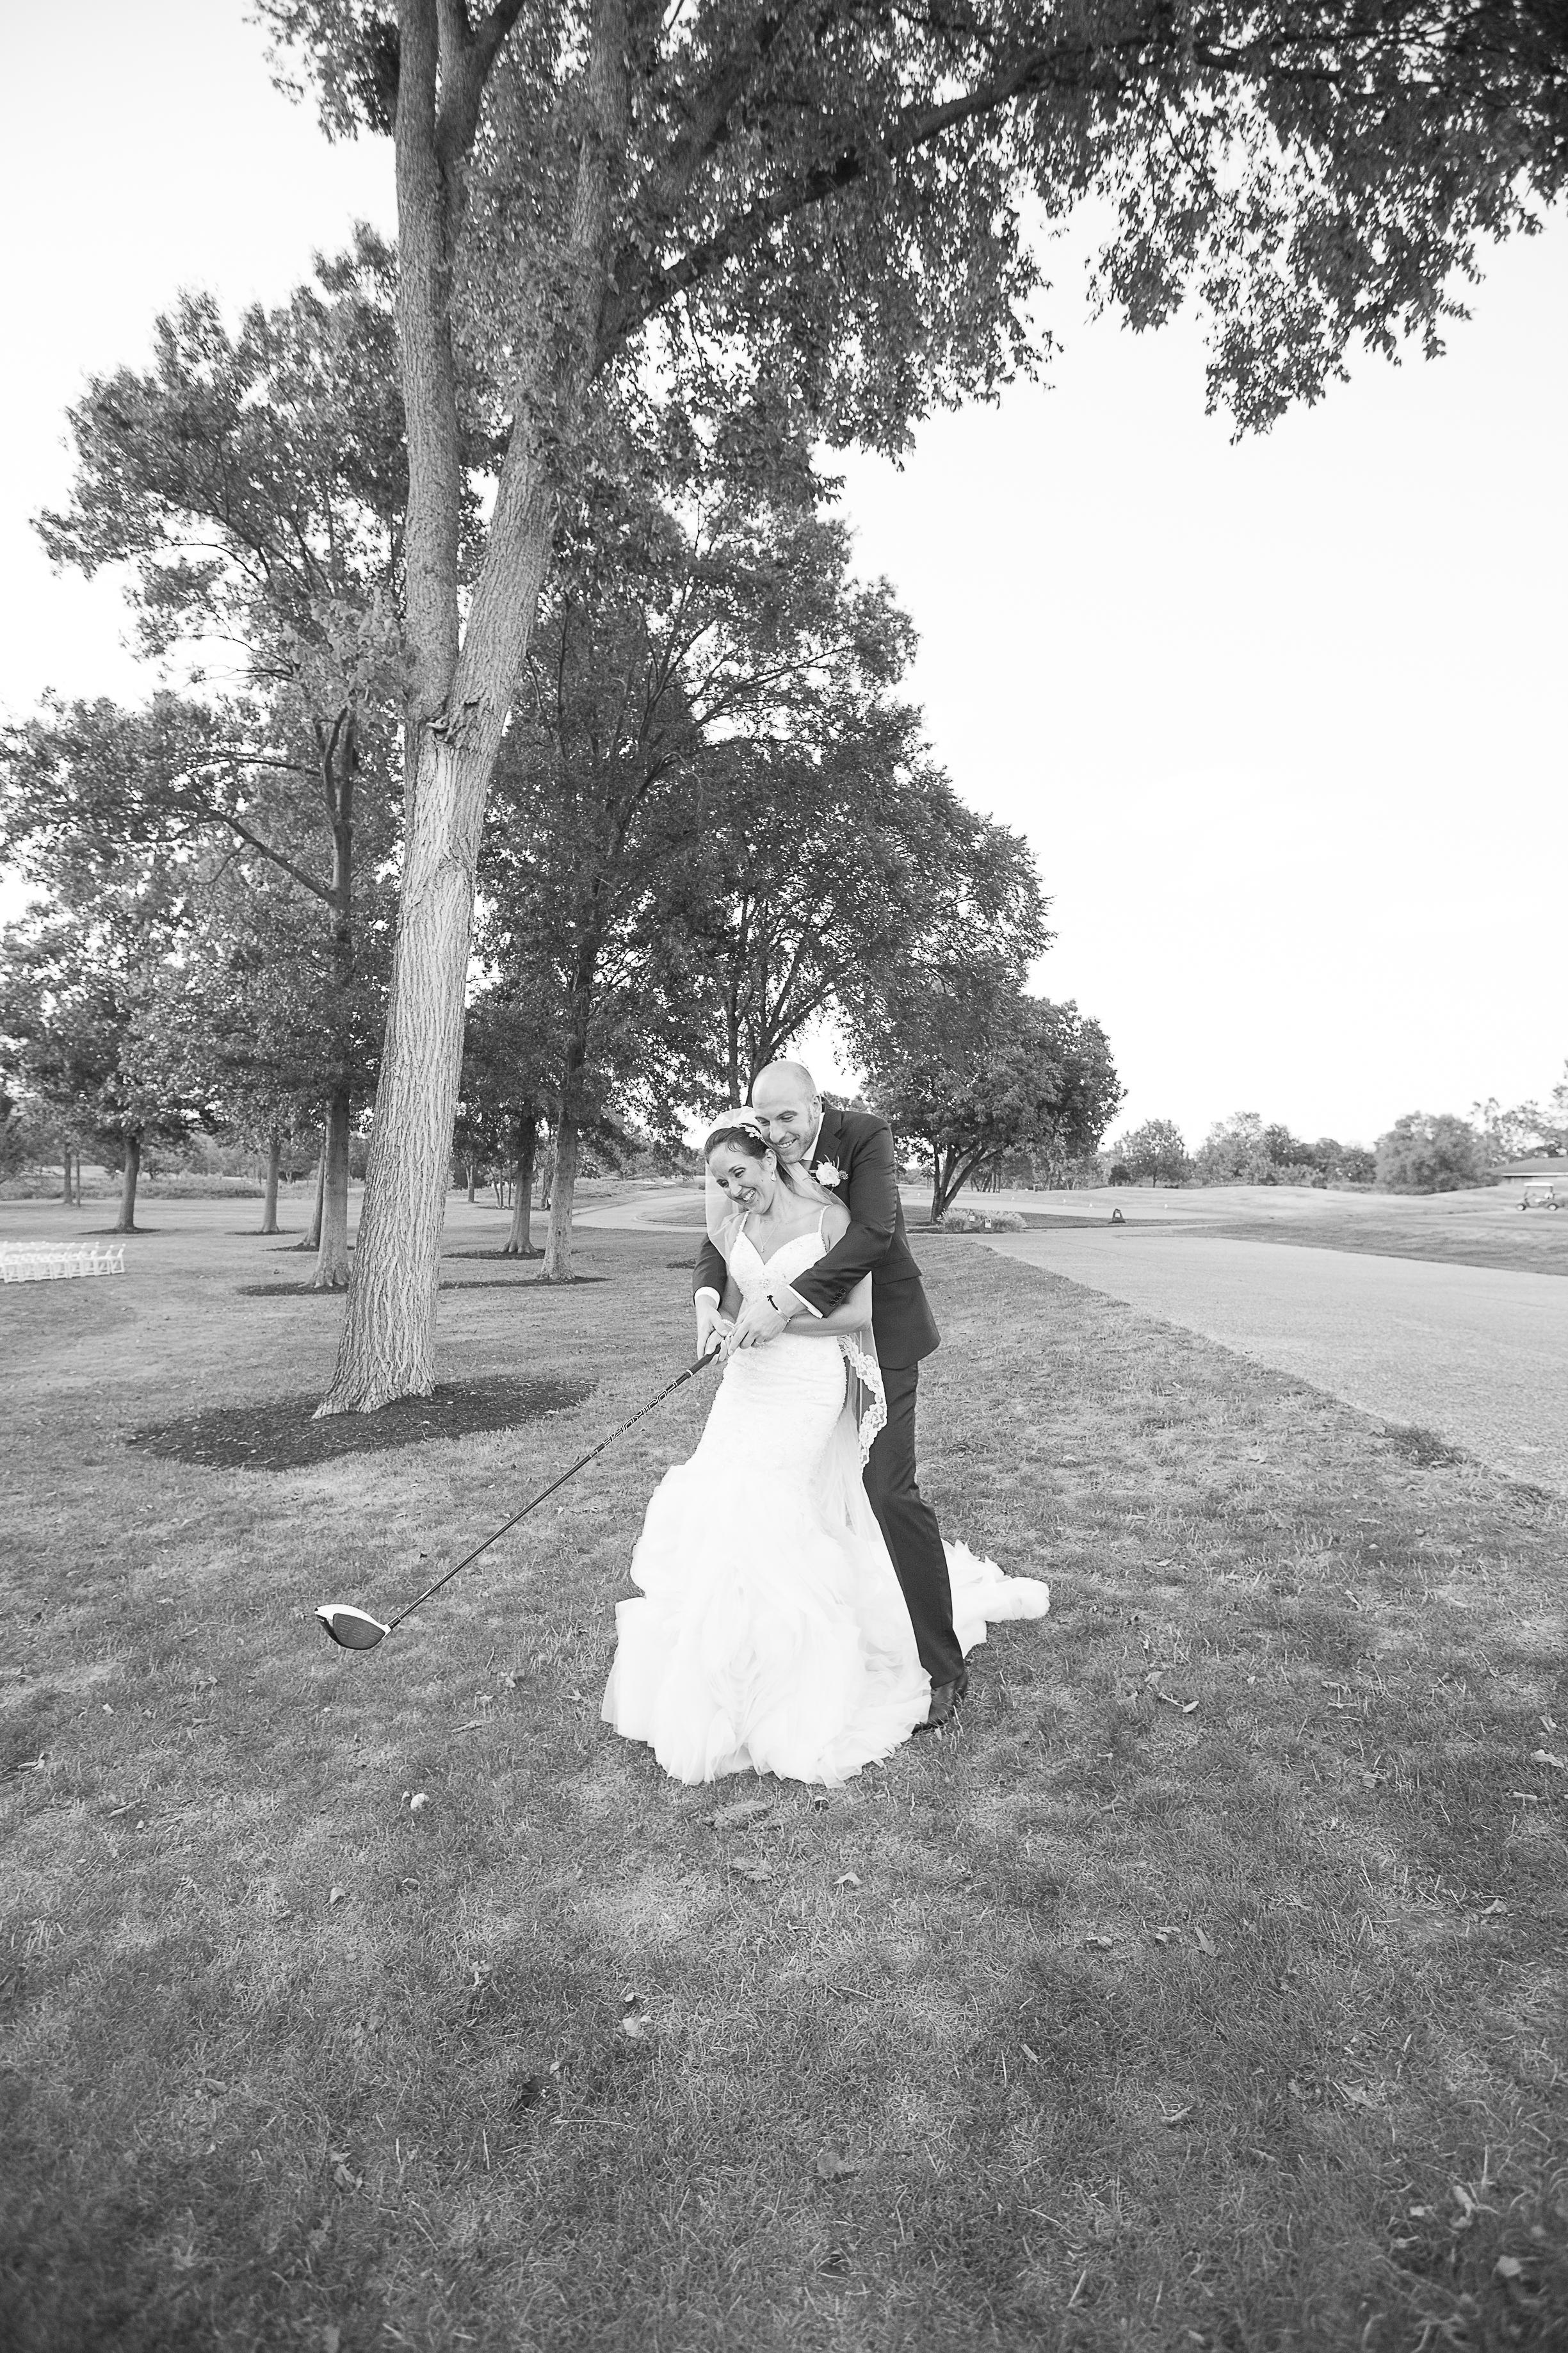 Marissa-Timon-Wedding-Kim-Pham-Clark-Photography-18.jpg